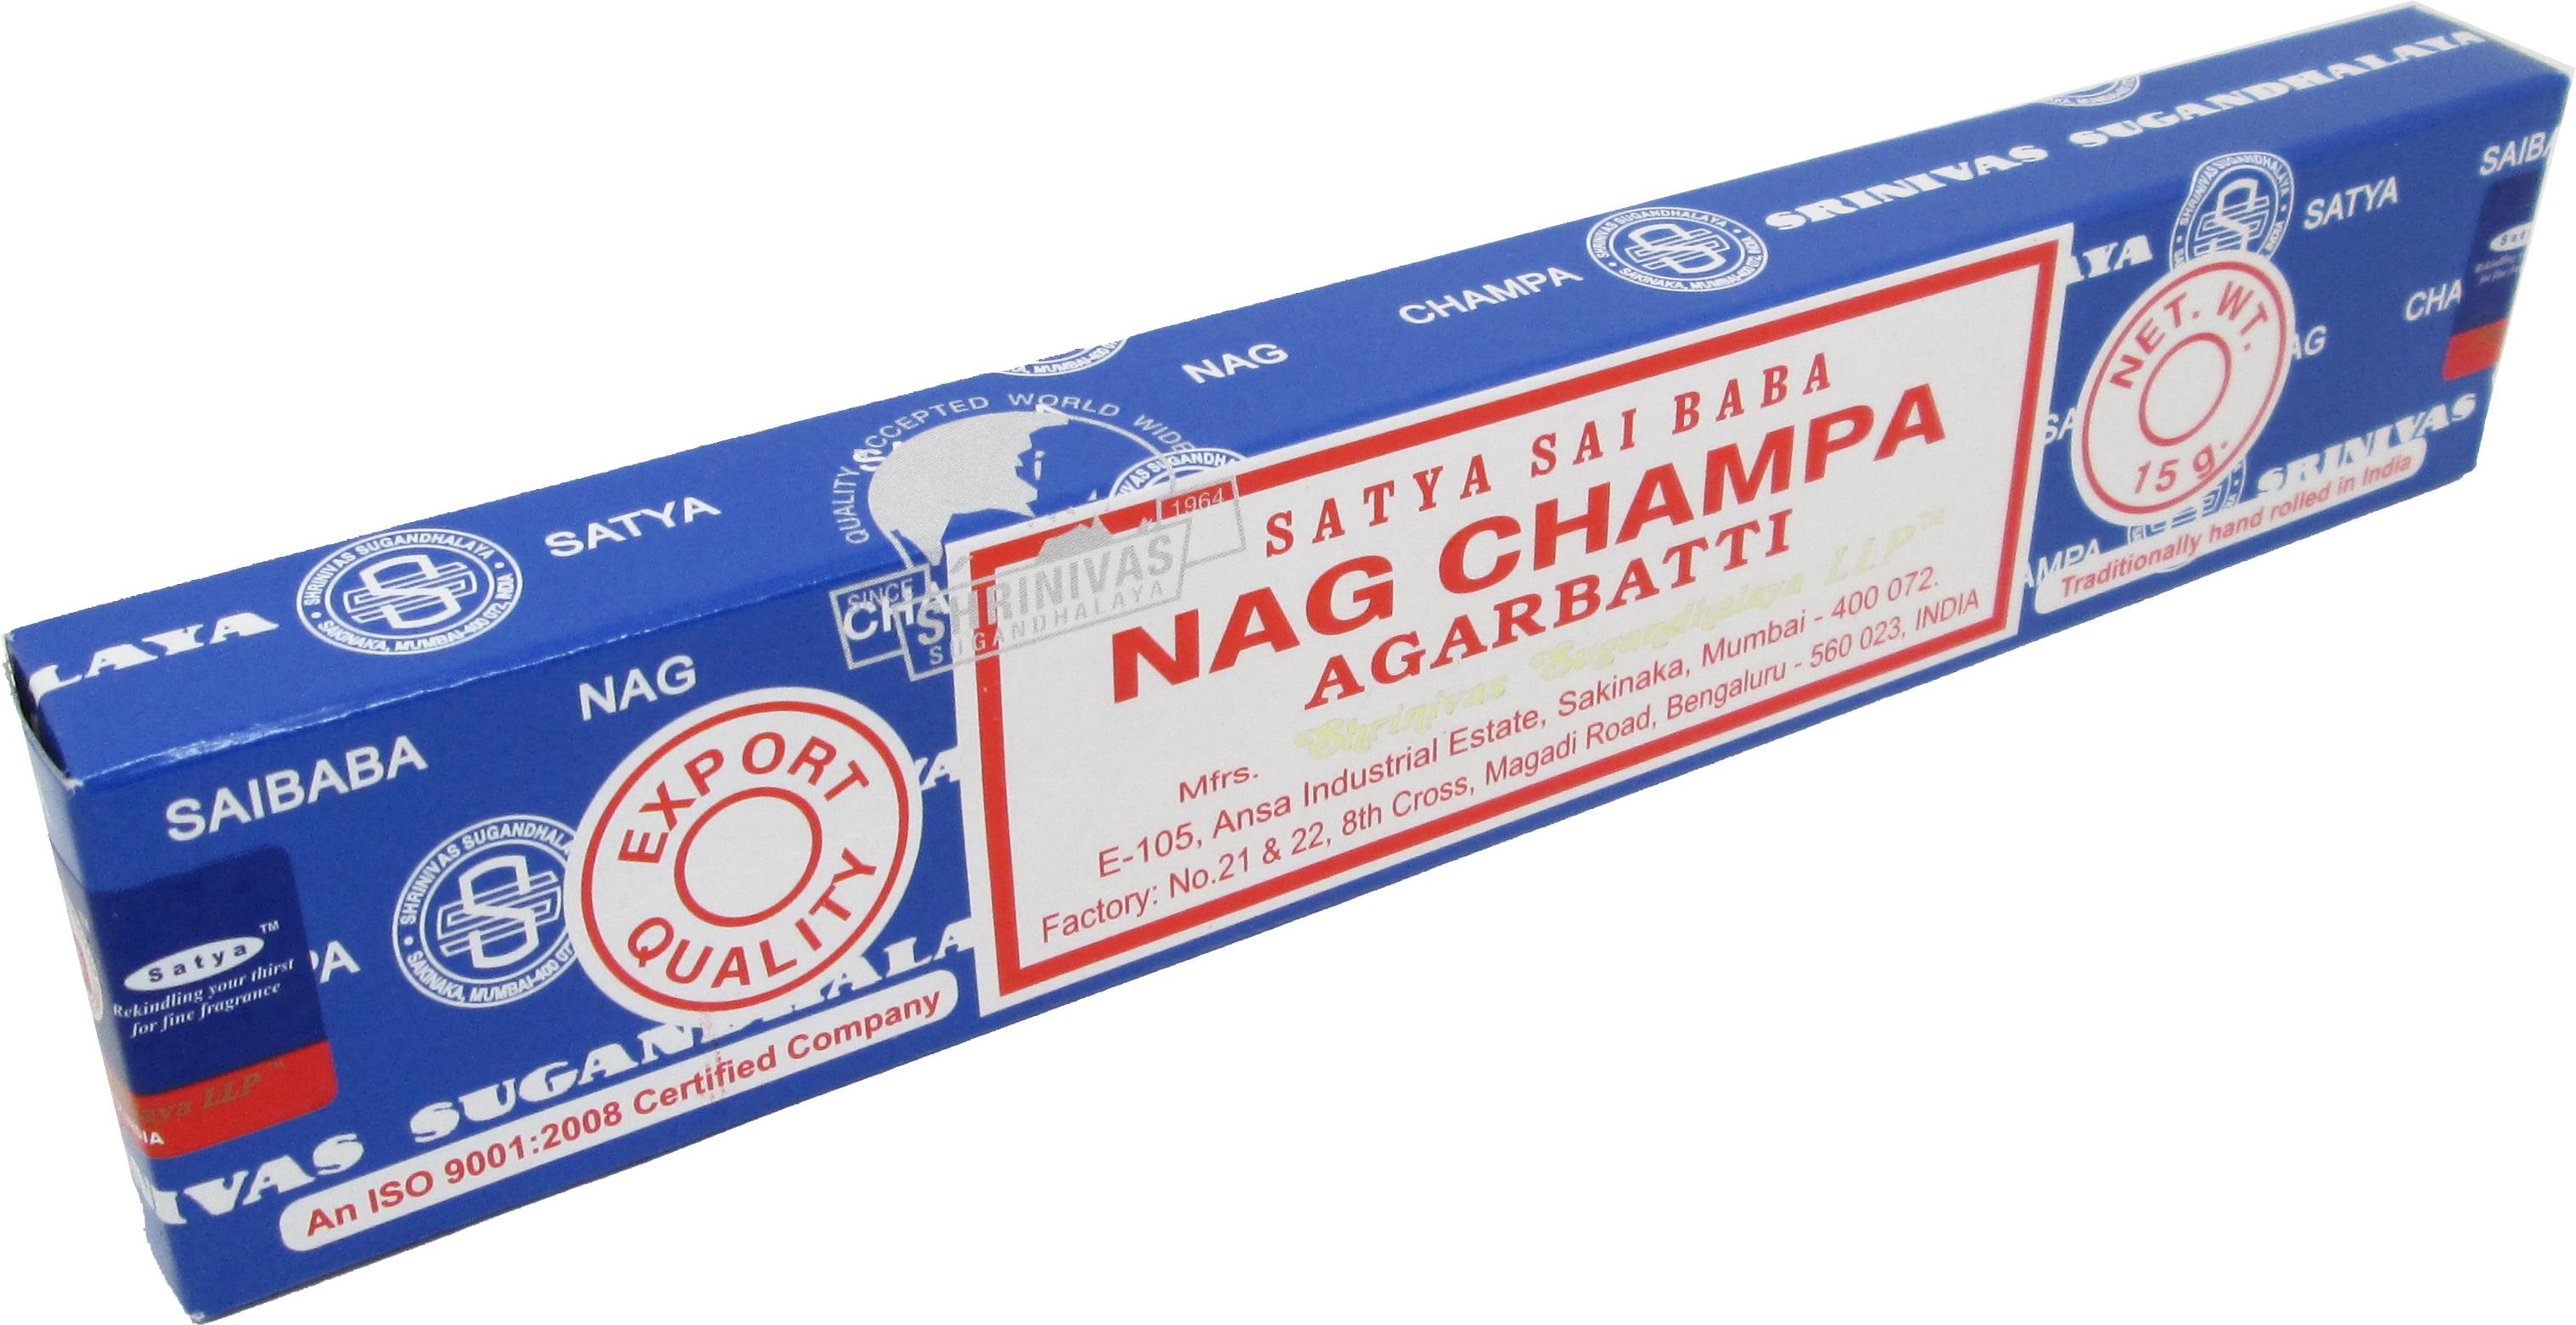 Satya Sai Baba Classic Nag Champa Agarbatti Incense Sticks 15 Sticks Per Box Brown 15 G Walmart Com Walmart Com